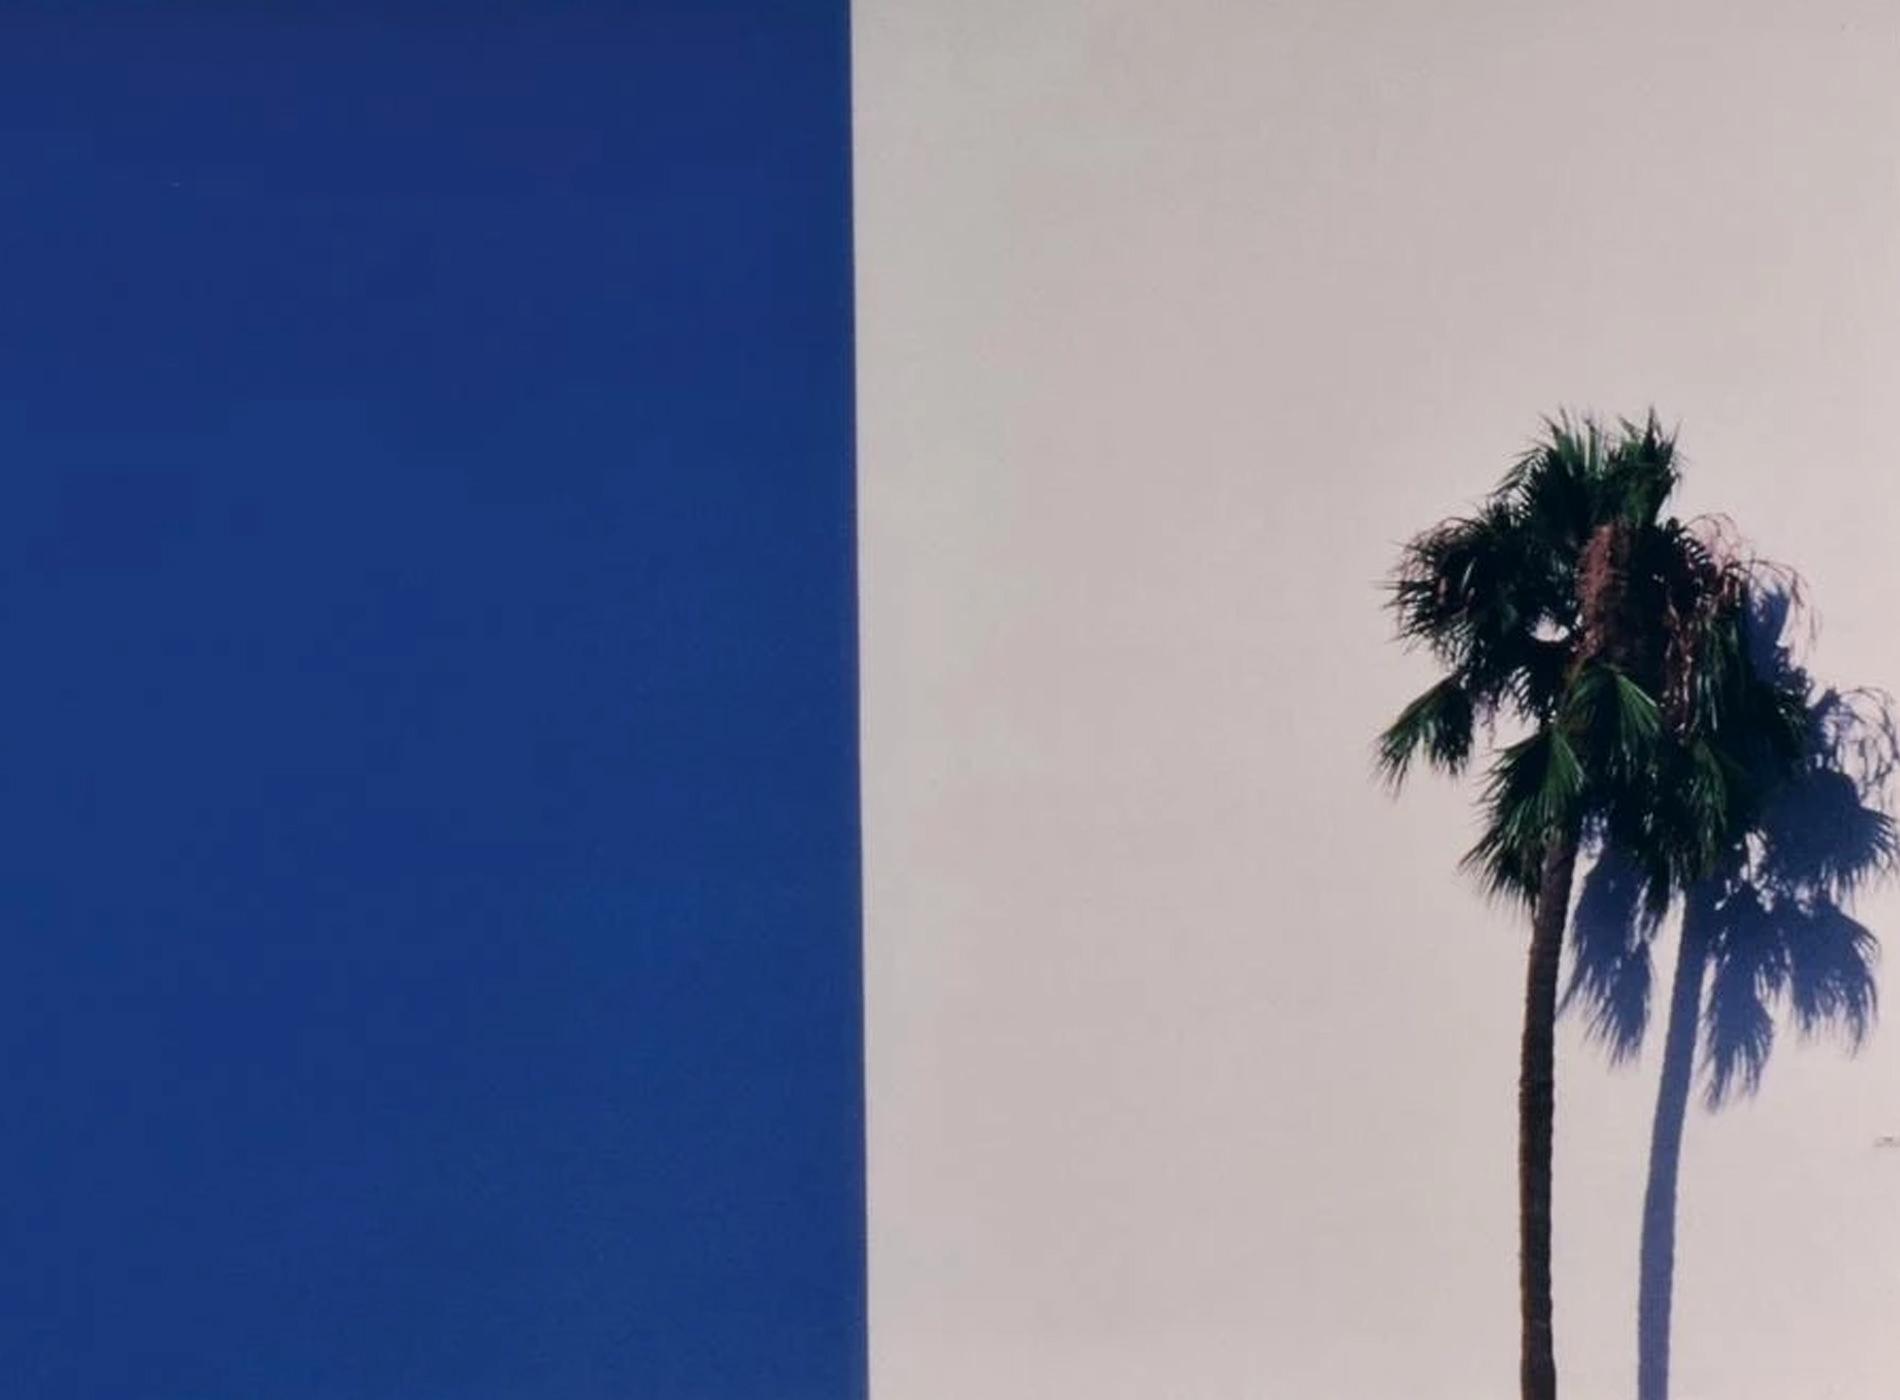 Franco Fontana Photographie Paesaggio Urbano Los Angeles 1979